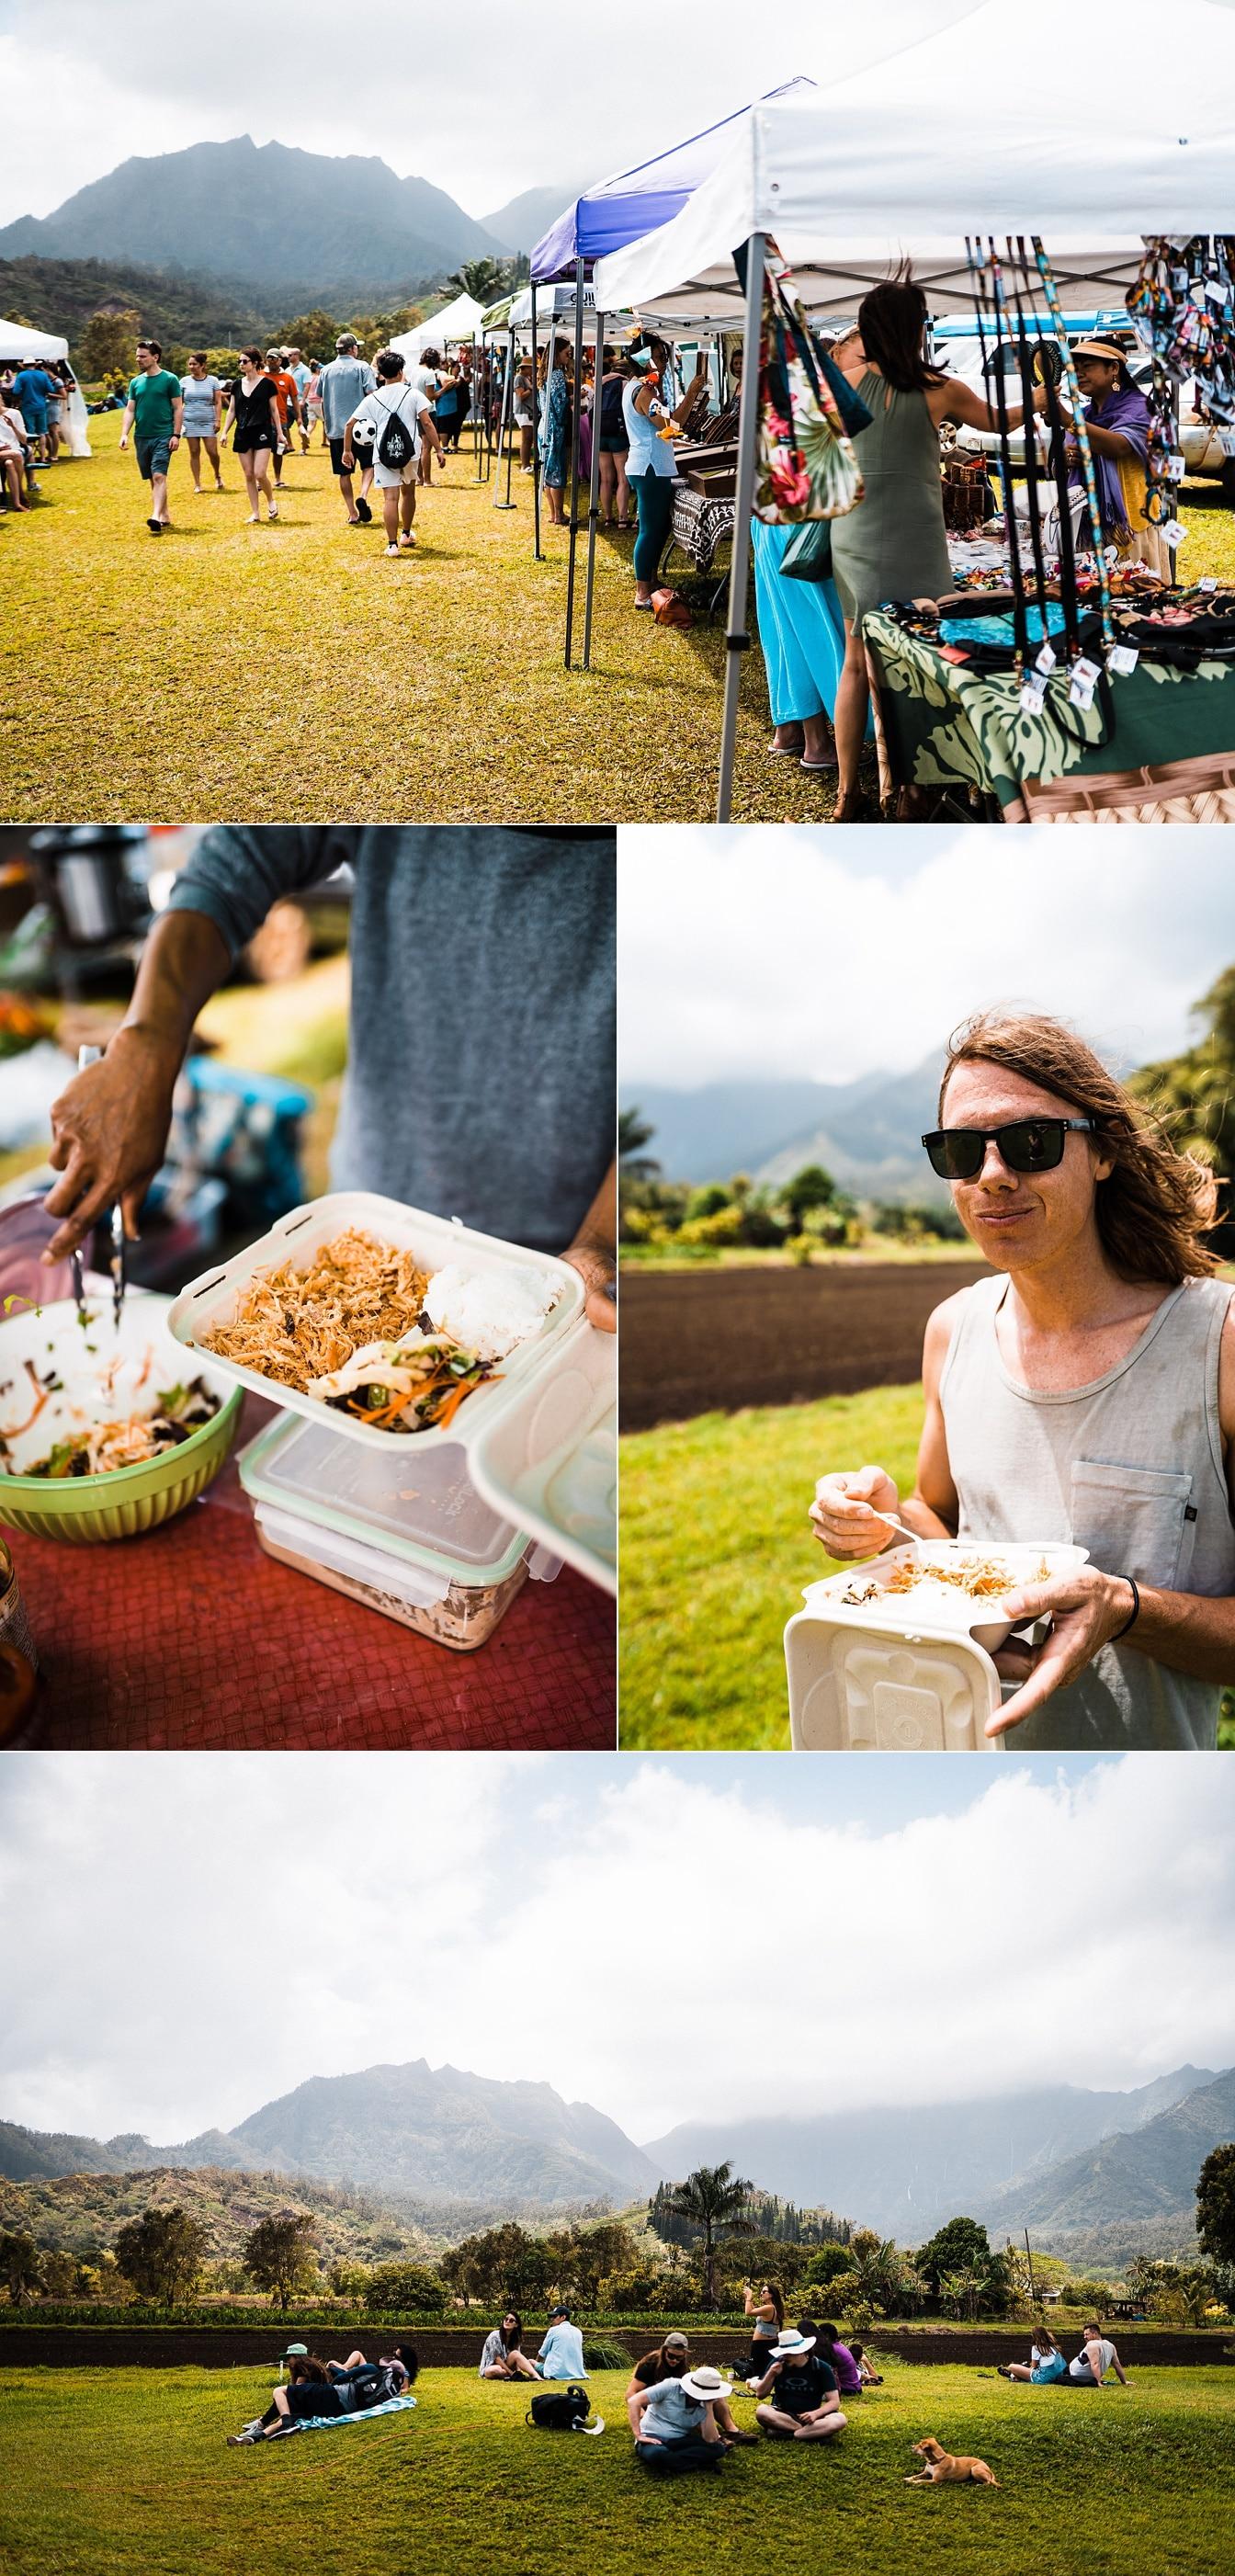 Kauai Hanalei Farmers Market